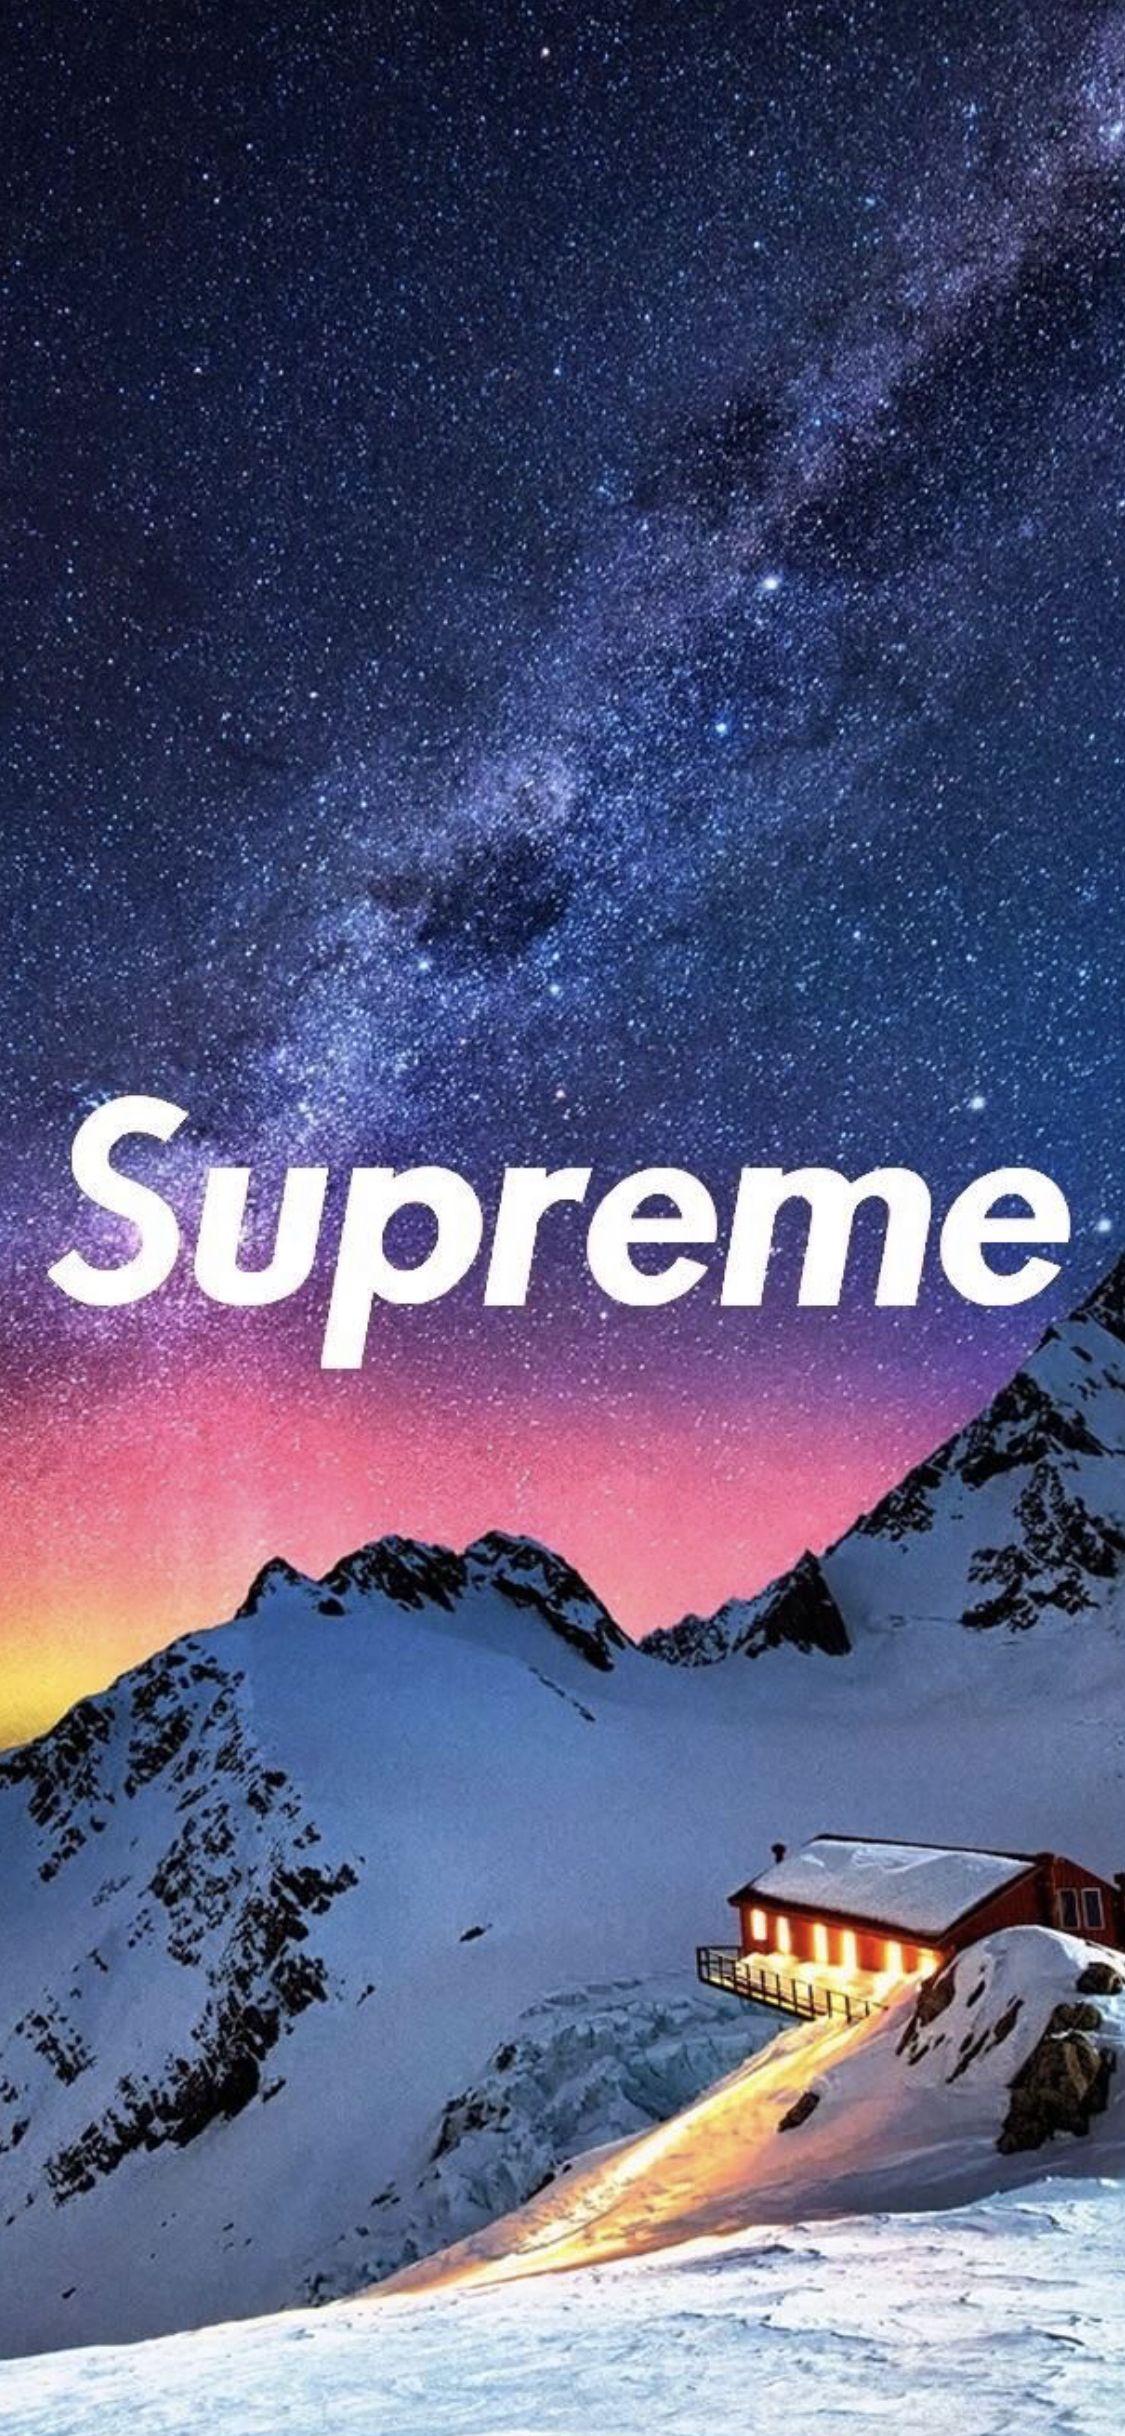 Pin by 🅖🅔🅔🅩🅨 🅖🅔🅔🅩🅨 on ᴴʸᵖᵉᵇᵉᵃˢᵗ in 2020 Supreme